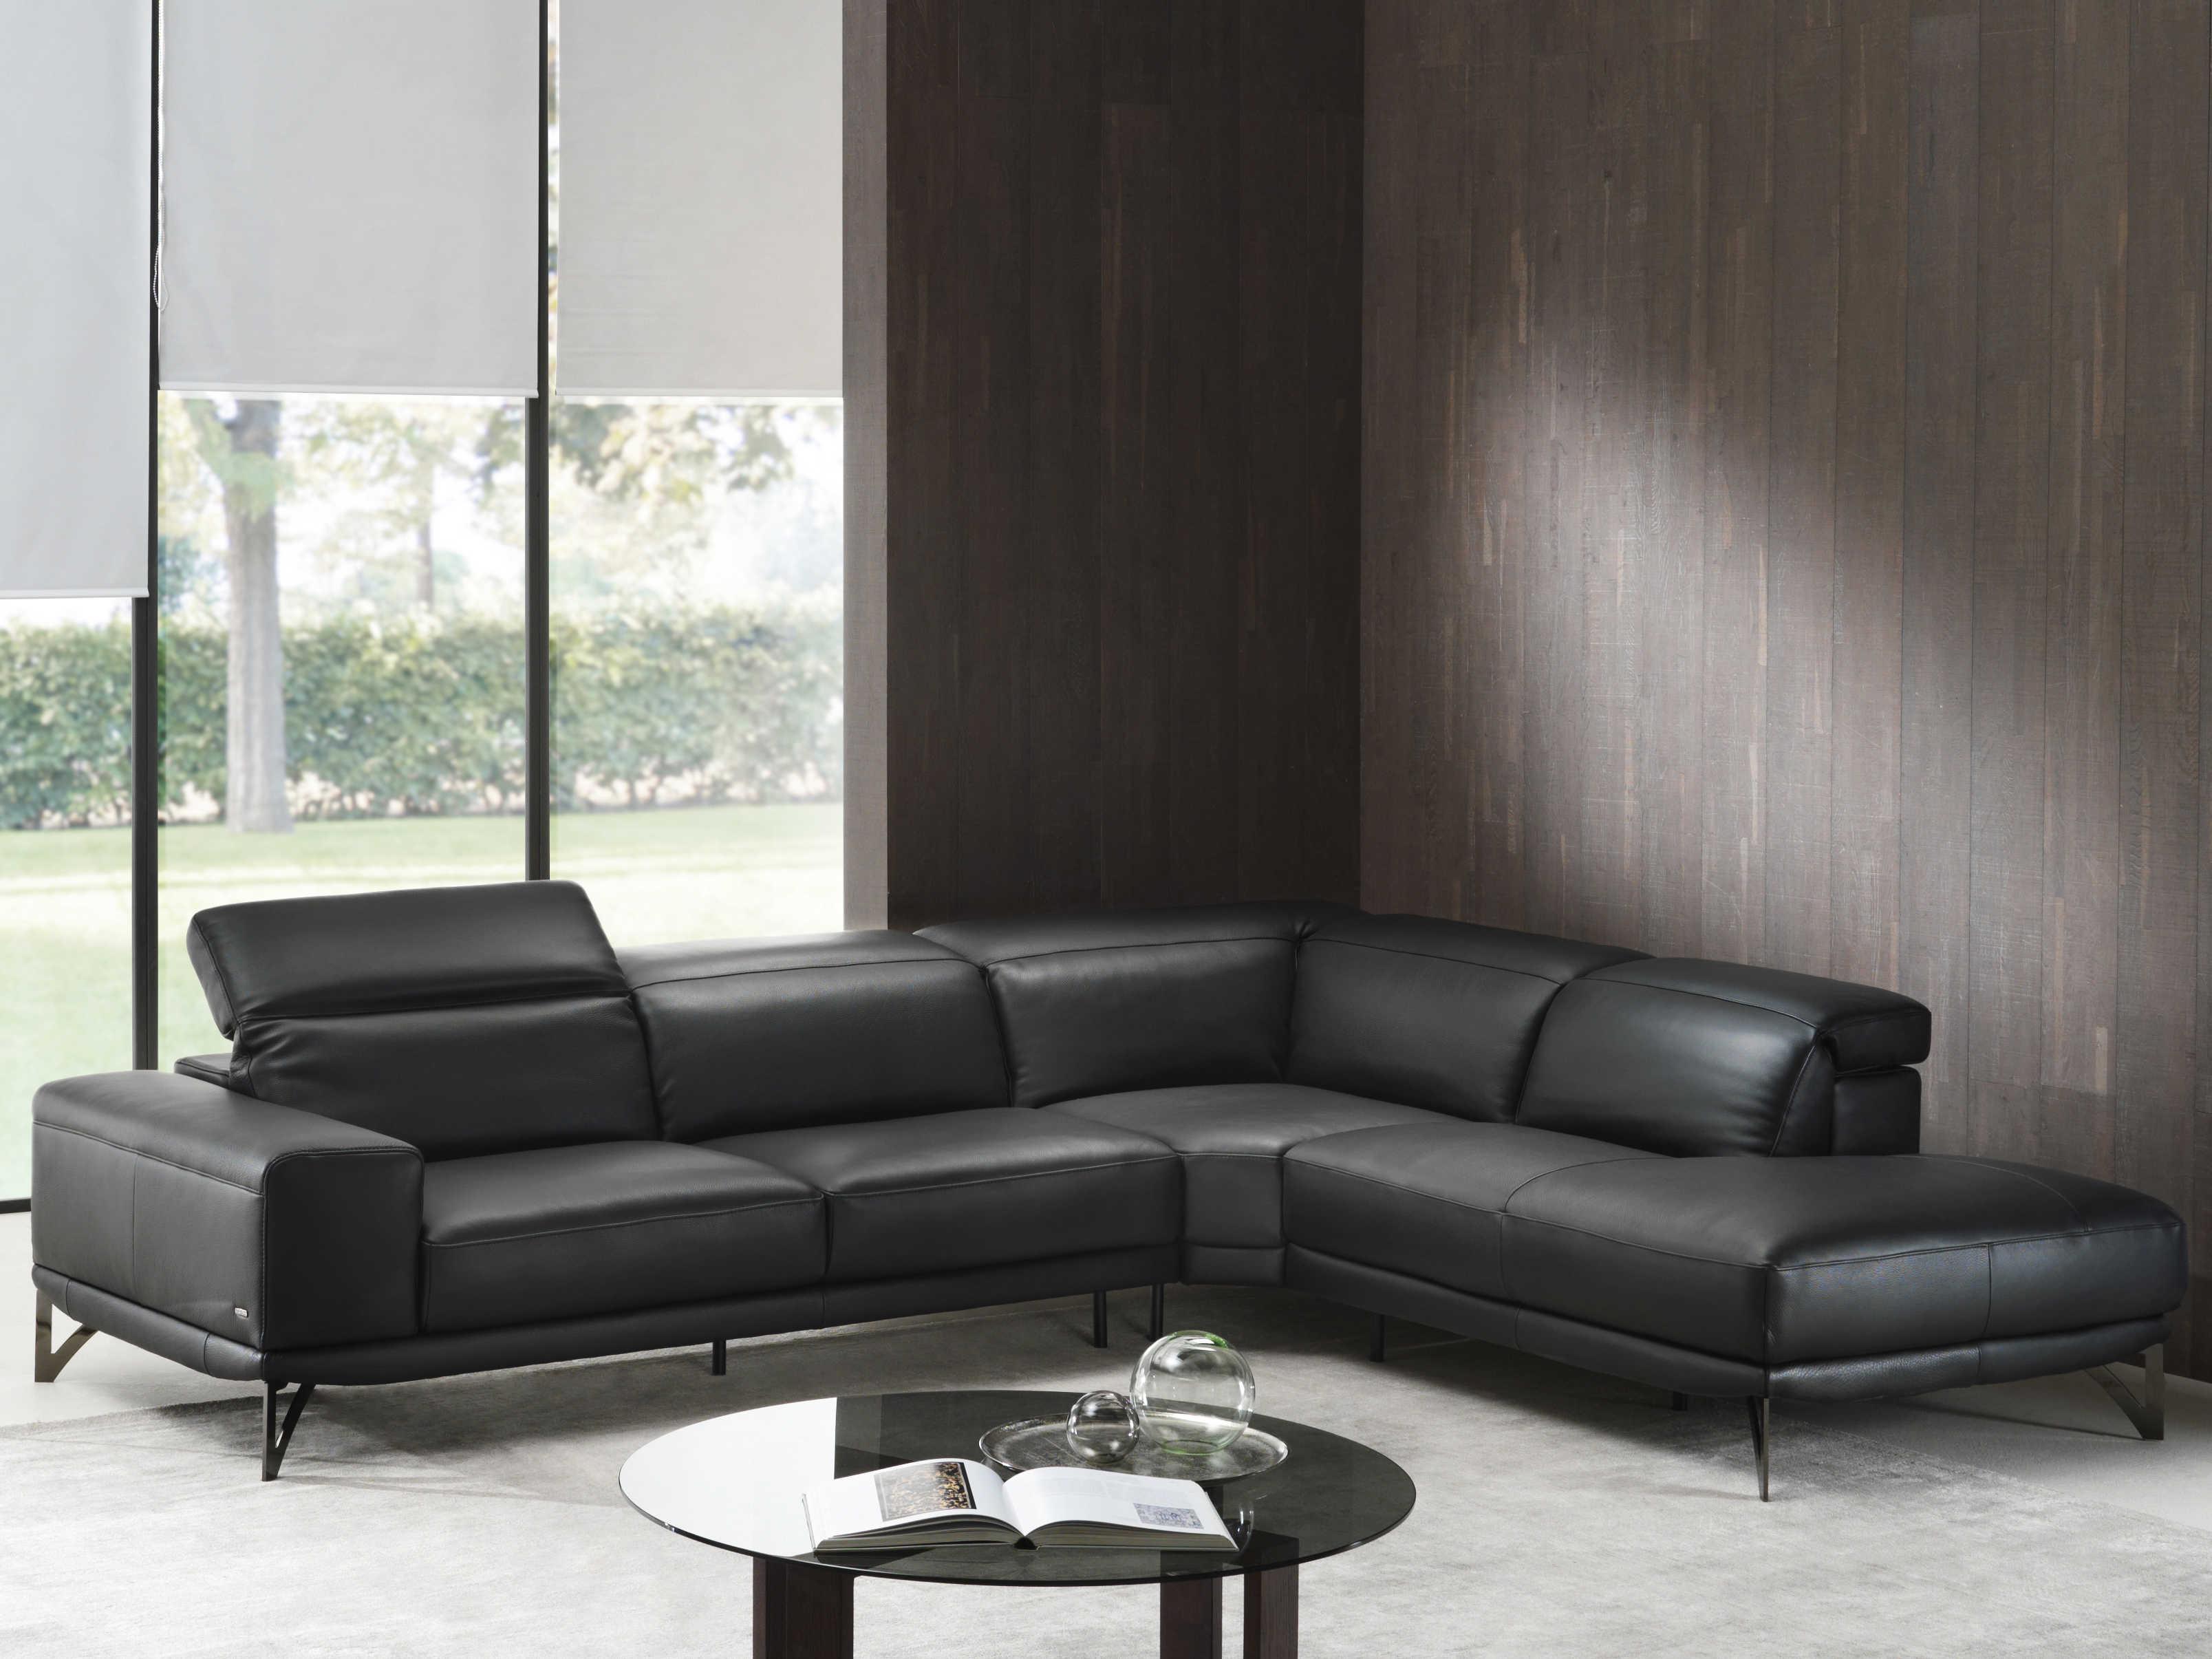 Natuzzi Editions Vigore Sectional Sofa